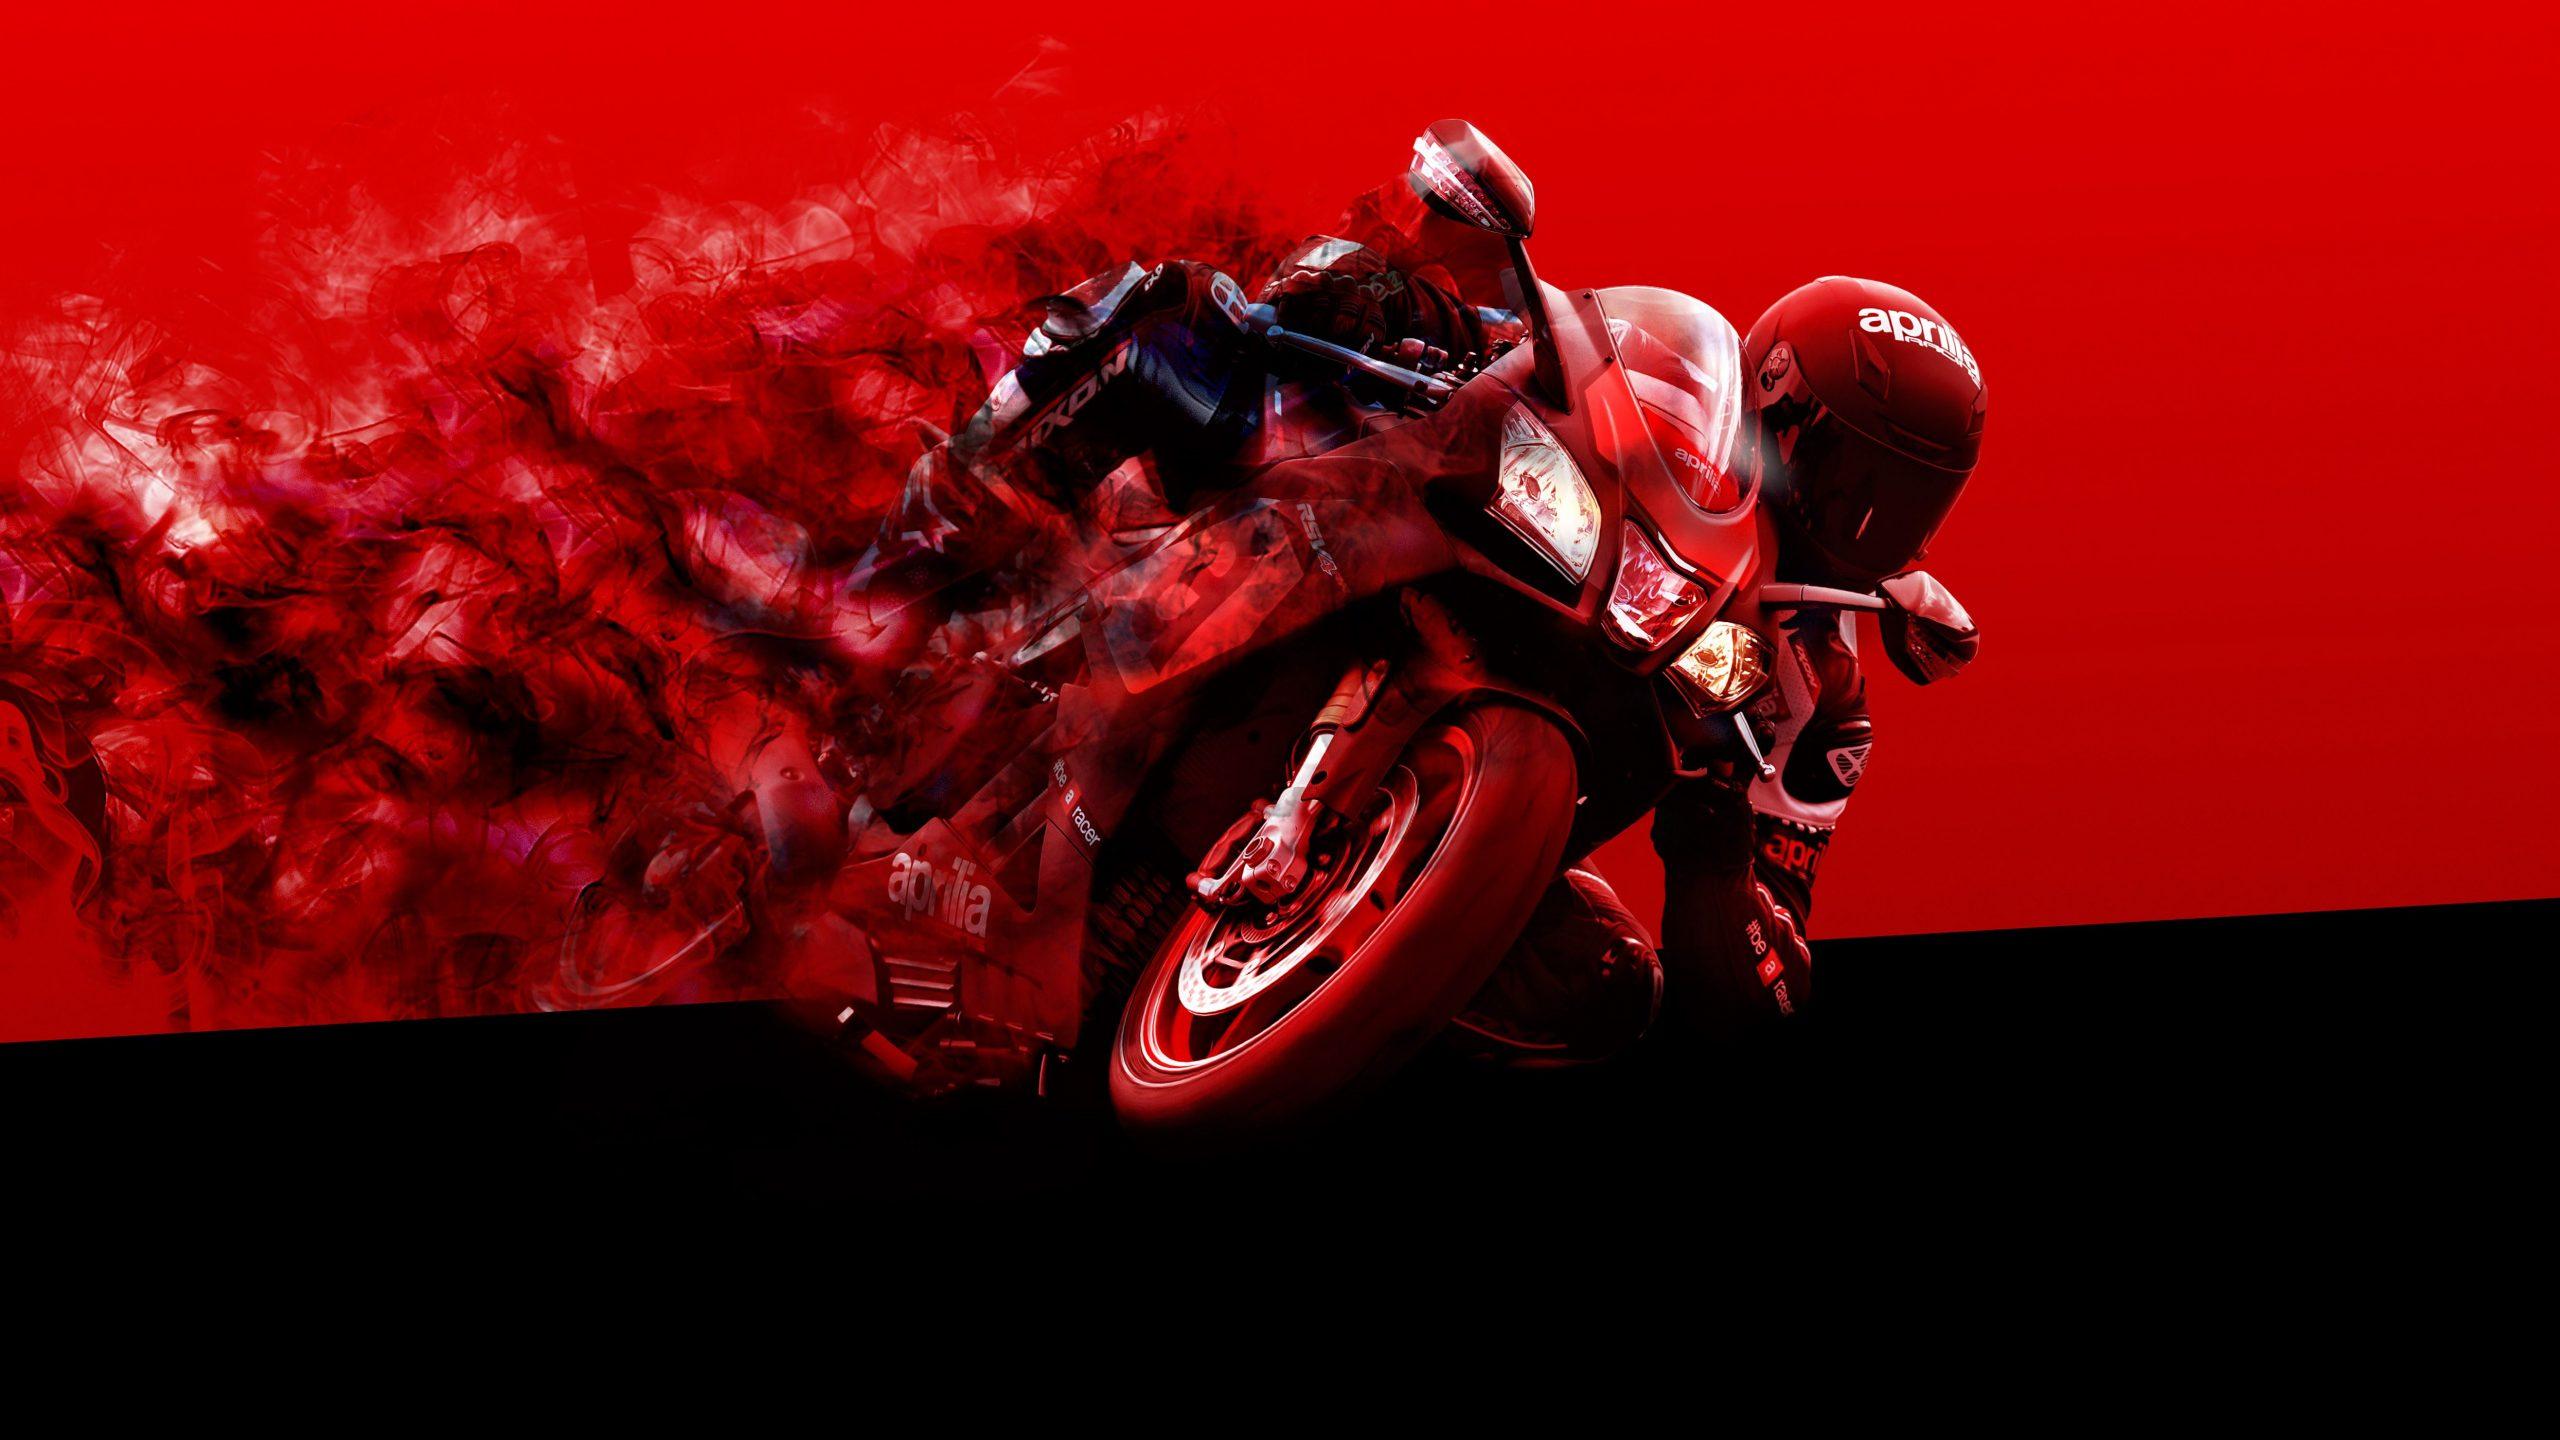 Aprilia Motorcycle [4K] Wallpapers BadAssHelmetStore 2560x1440